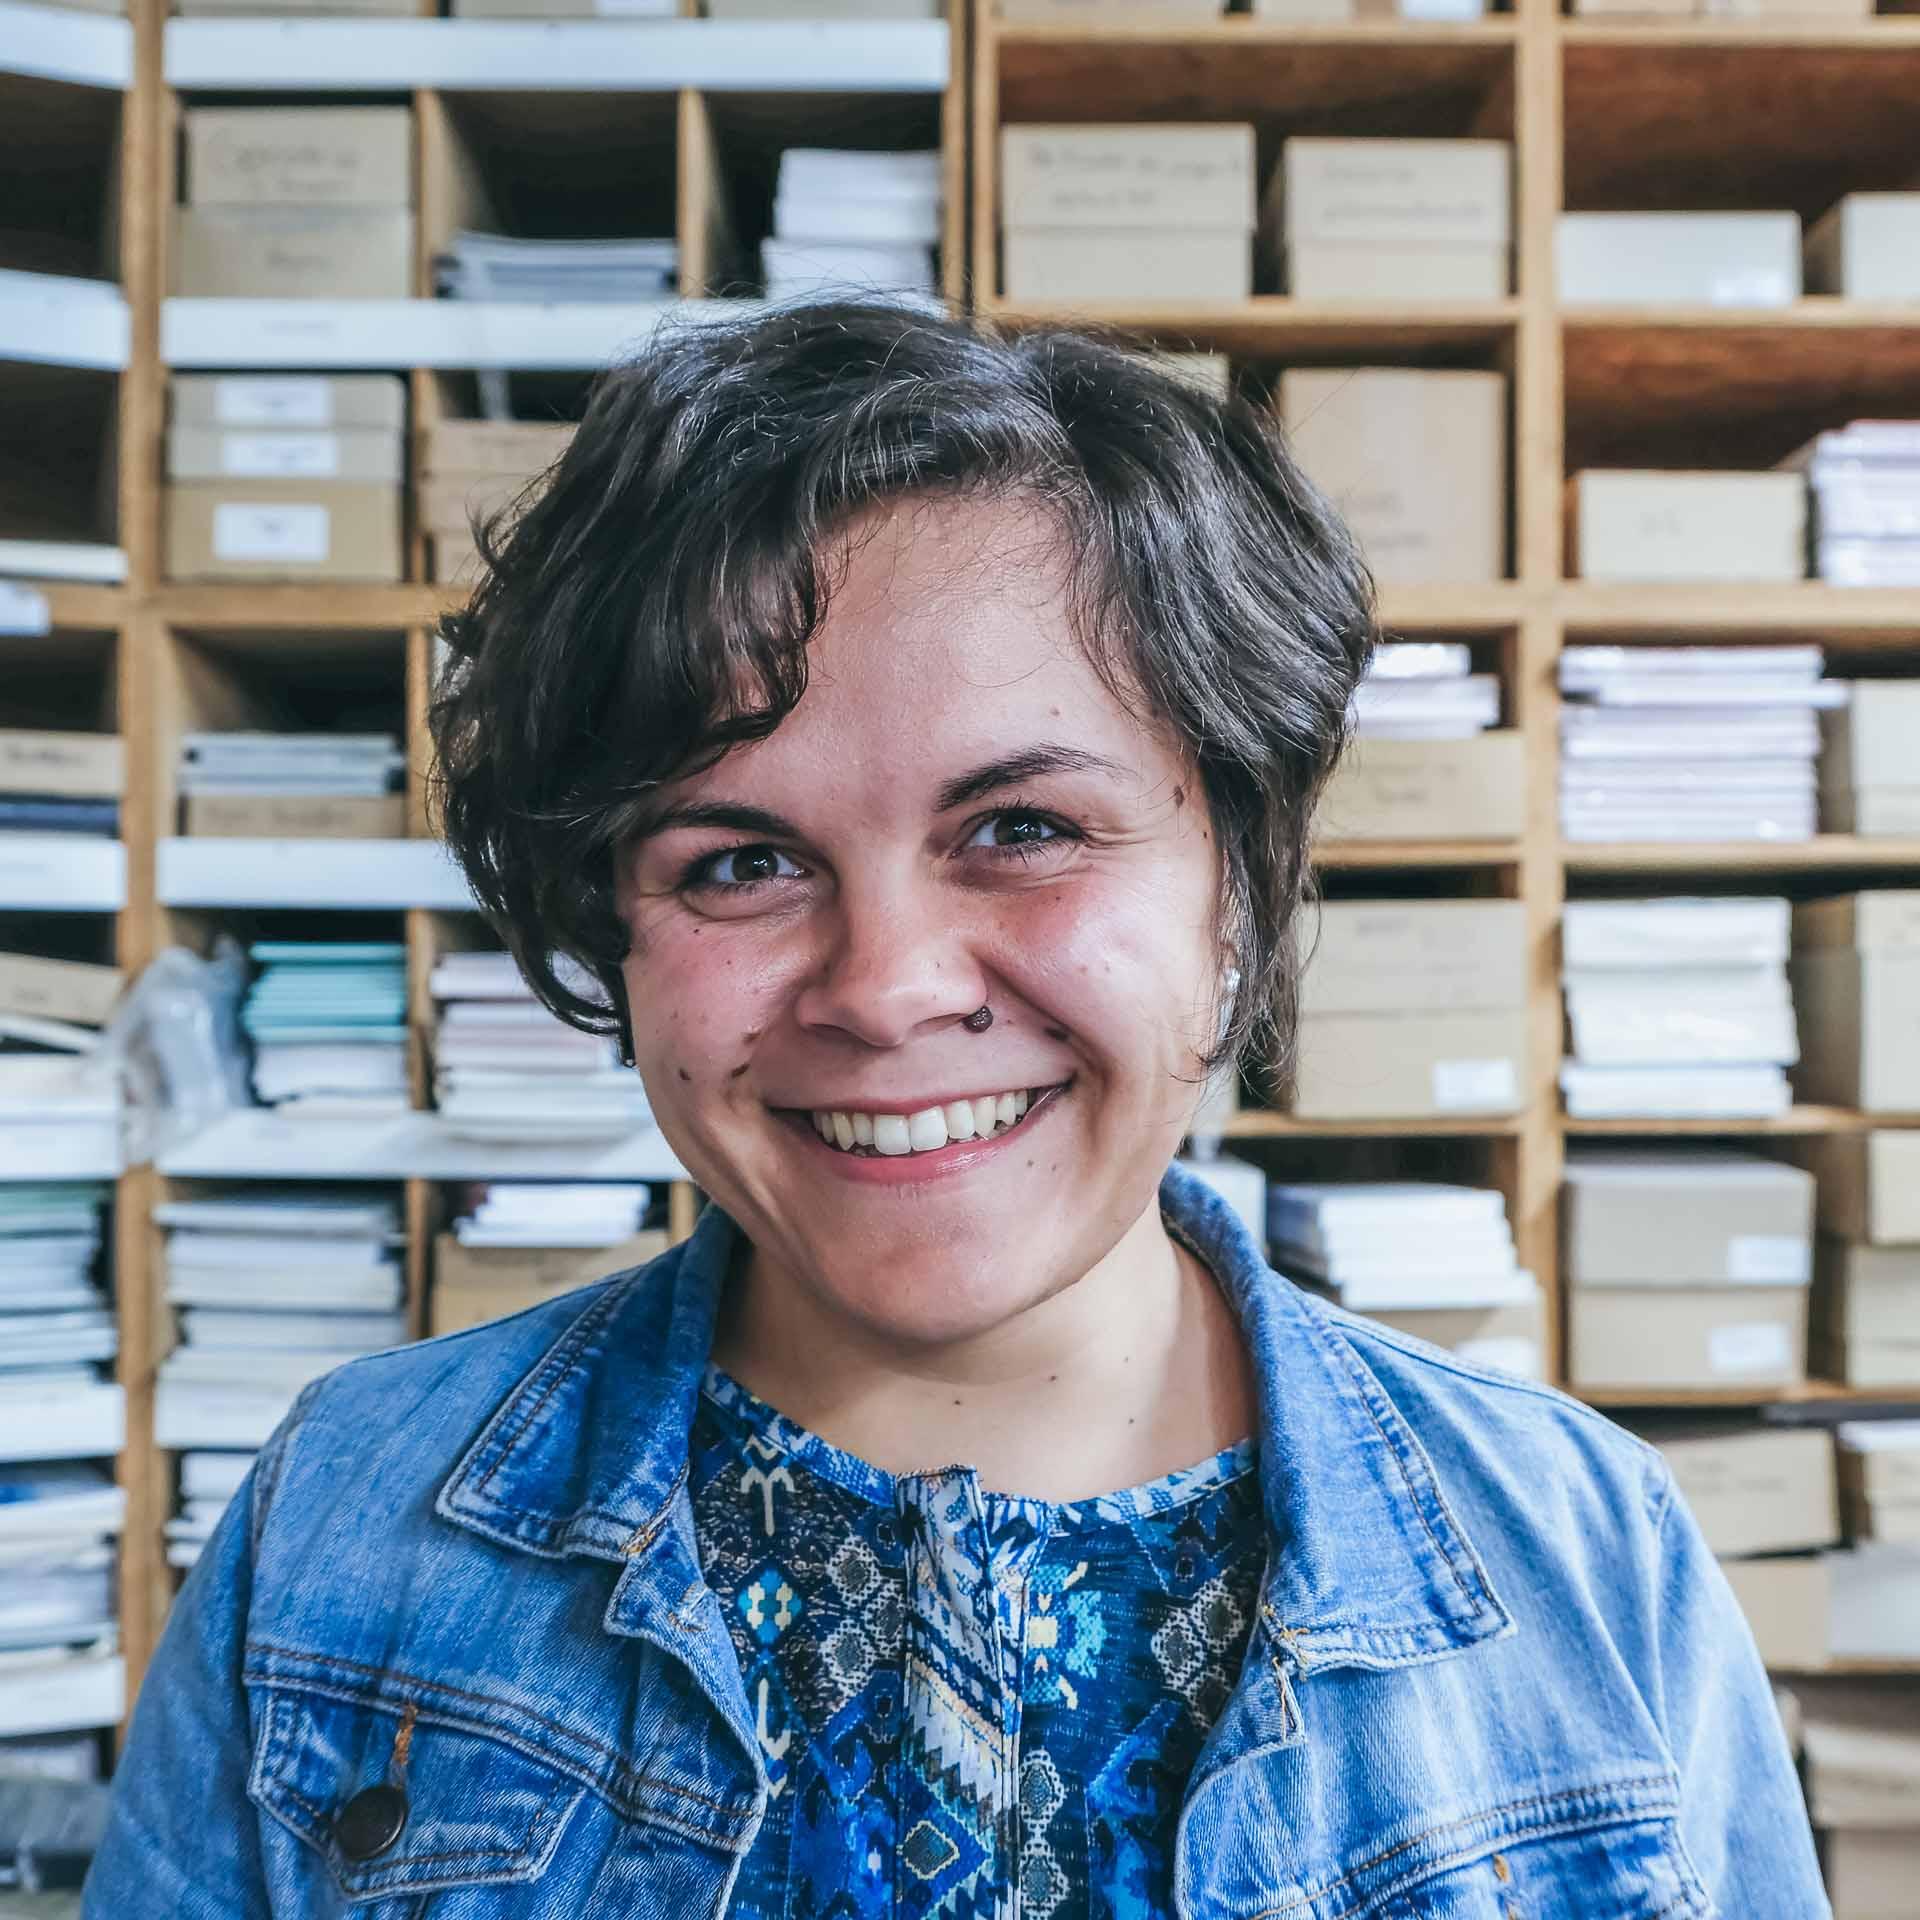 Simone Huber